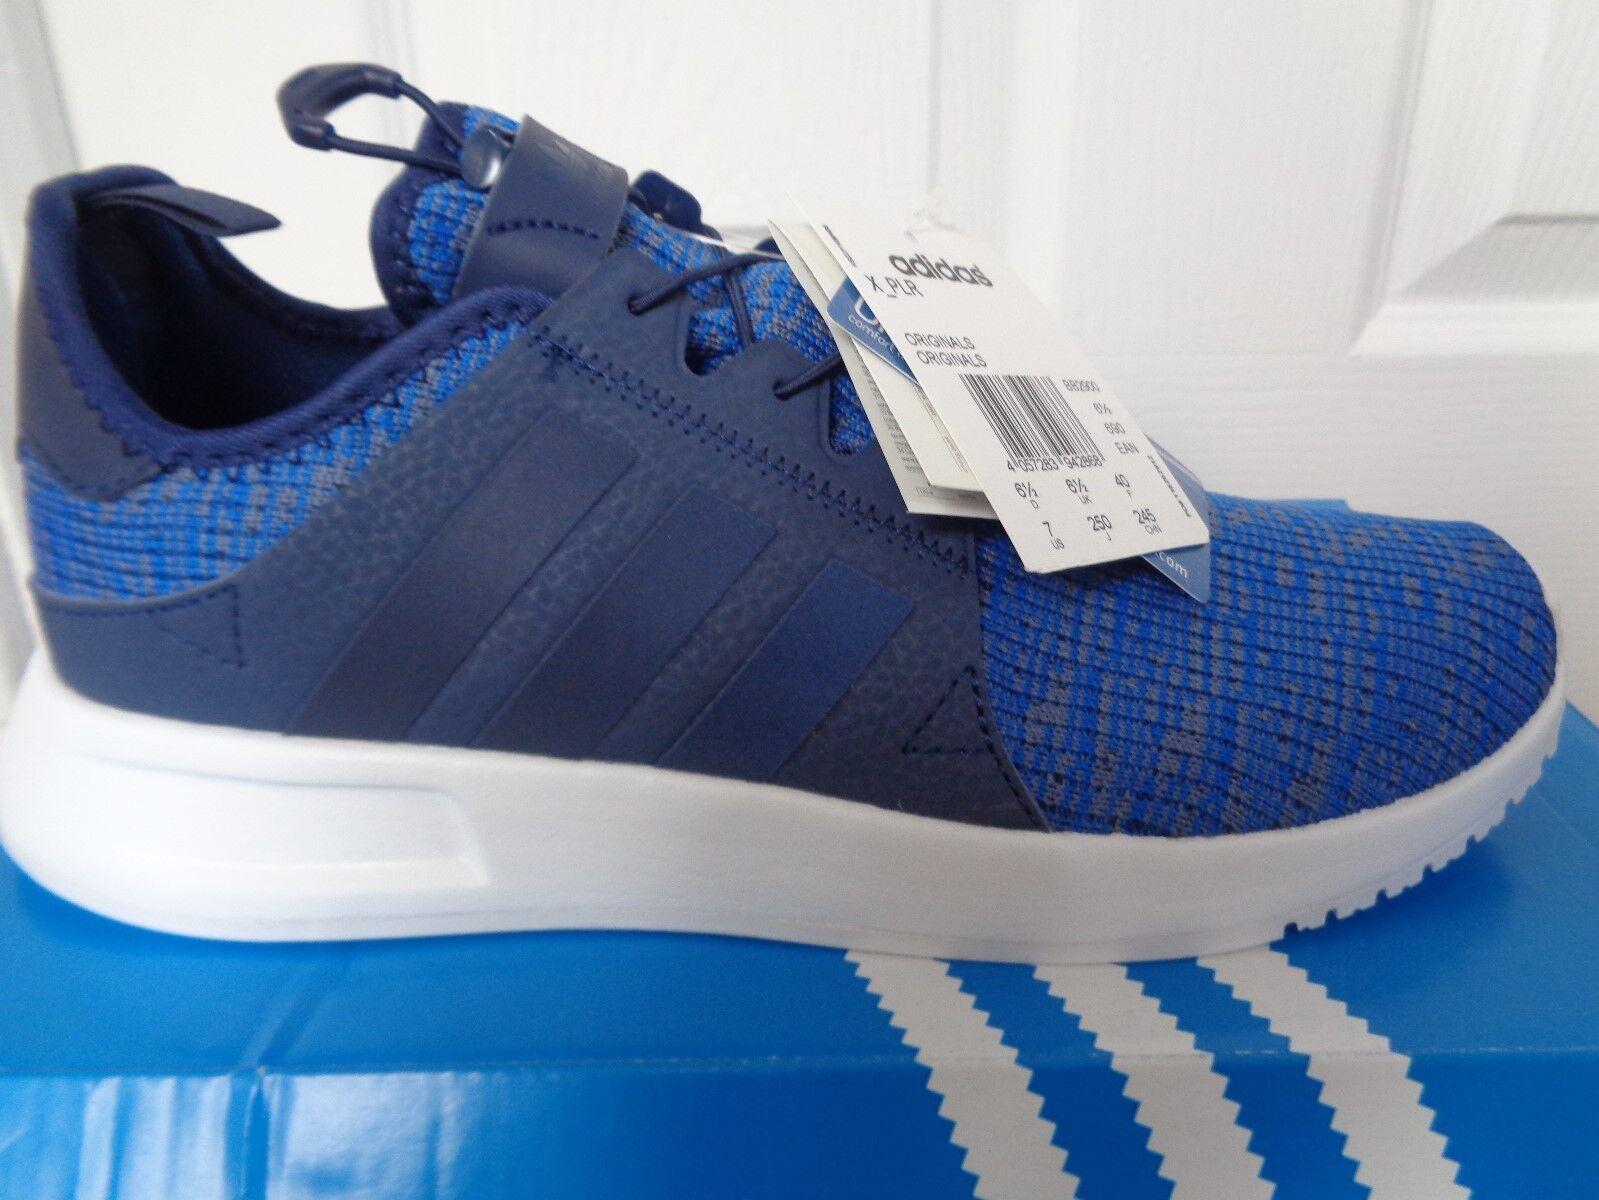 Adidas X_PLR mens sneakers trainers shoes BB2900 uk 6.5 eu 40 us 7 NEW+BOX